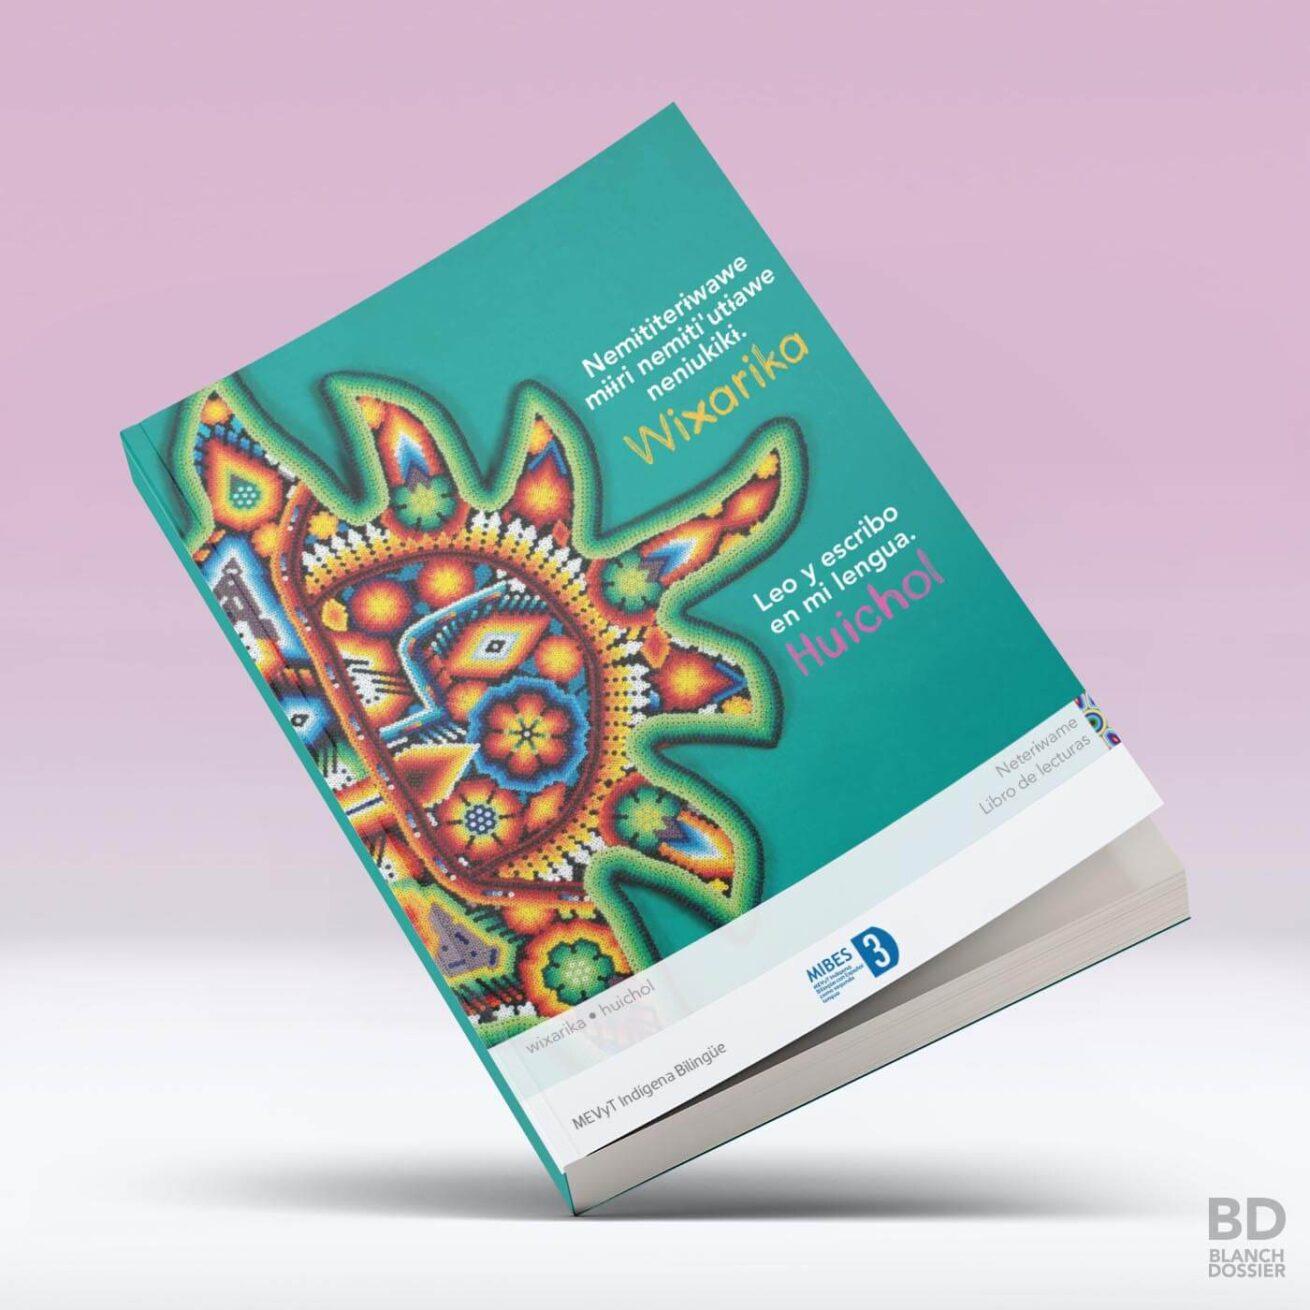 Libro INEA en lengua huichol-wixarika